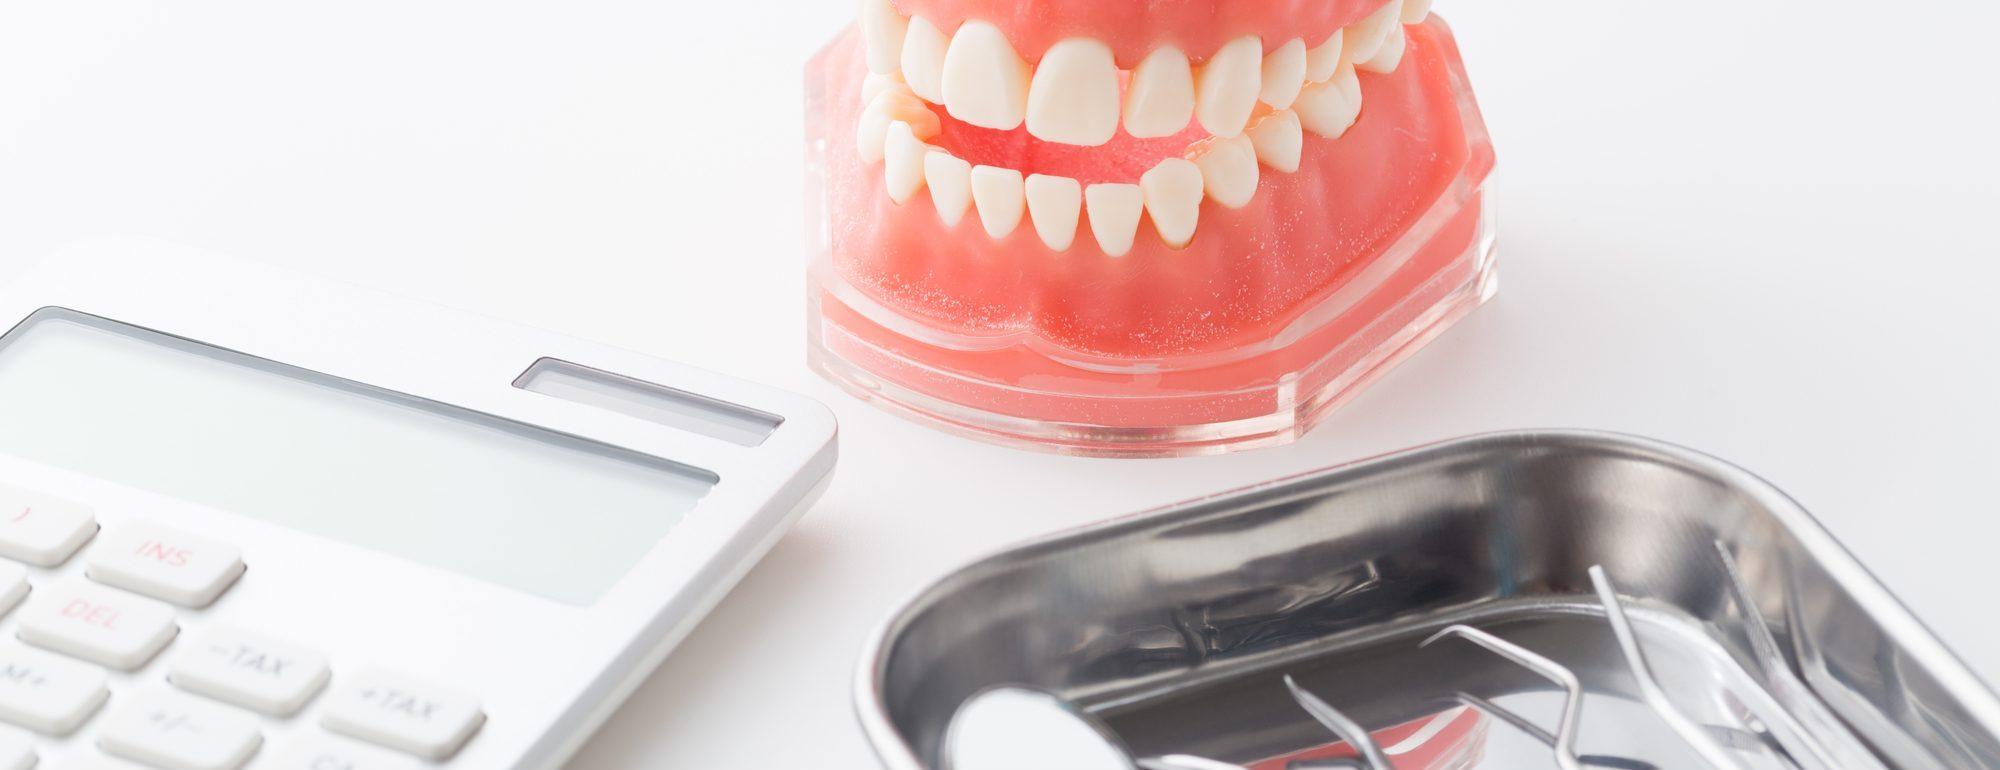 矯正歯科治療の費用|福島県浜通り